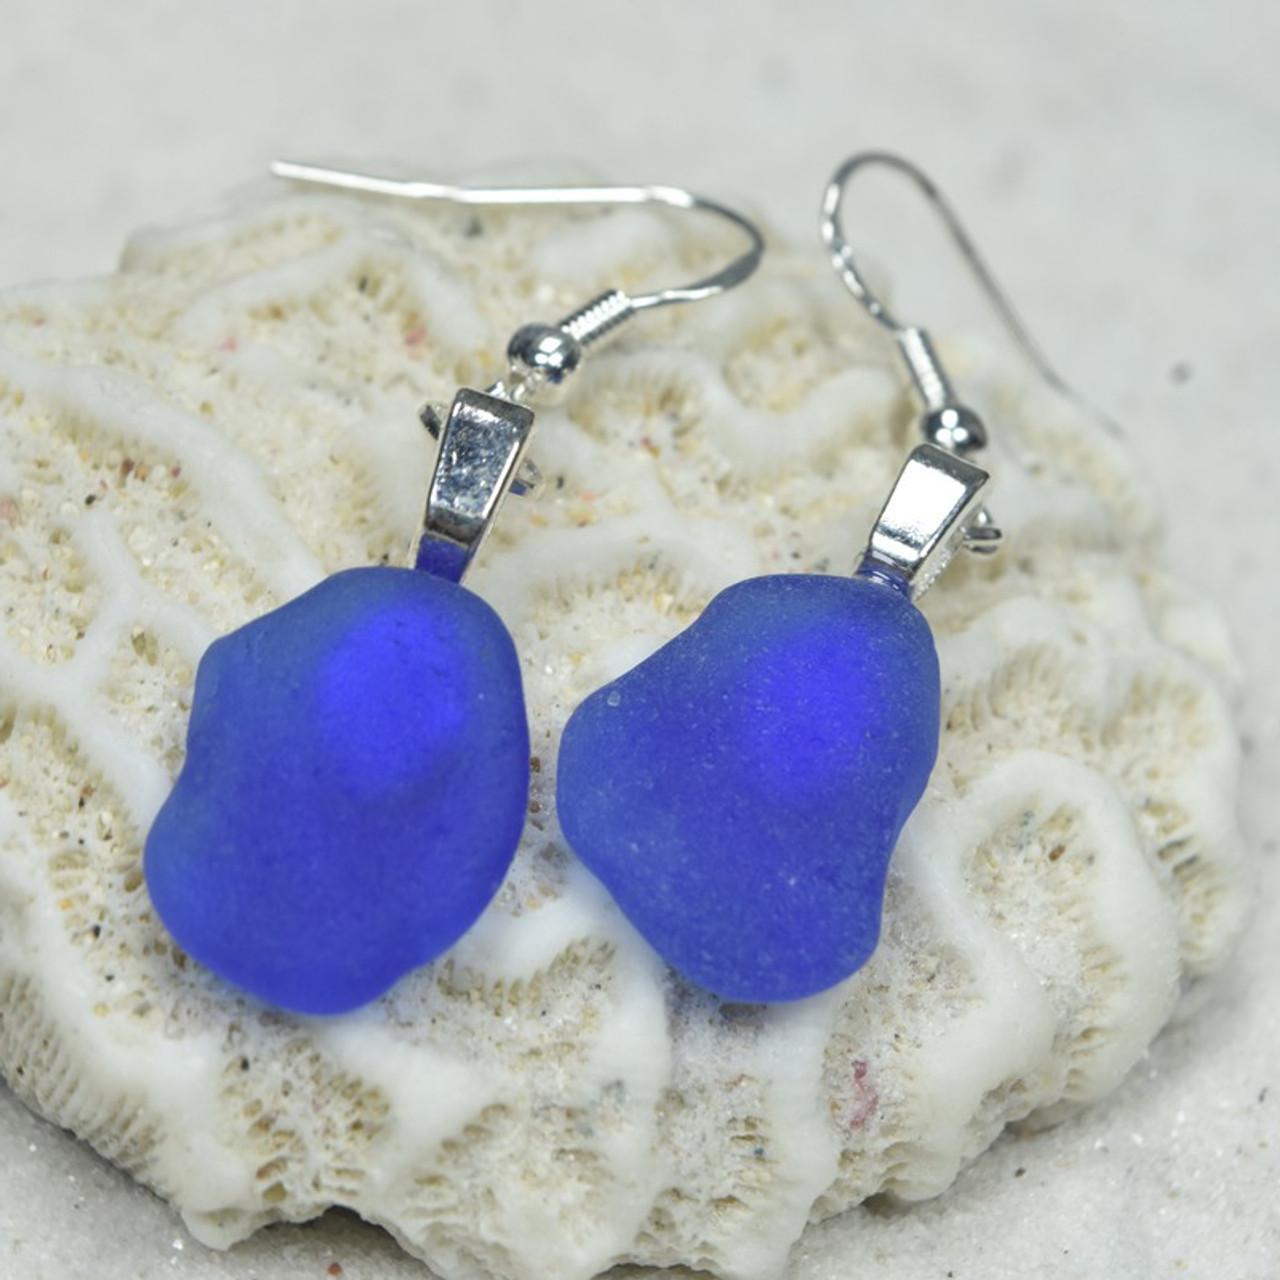 Dangling Cobalt Blue Sea Glass Earrings